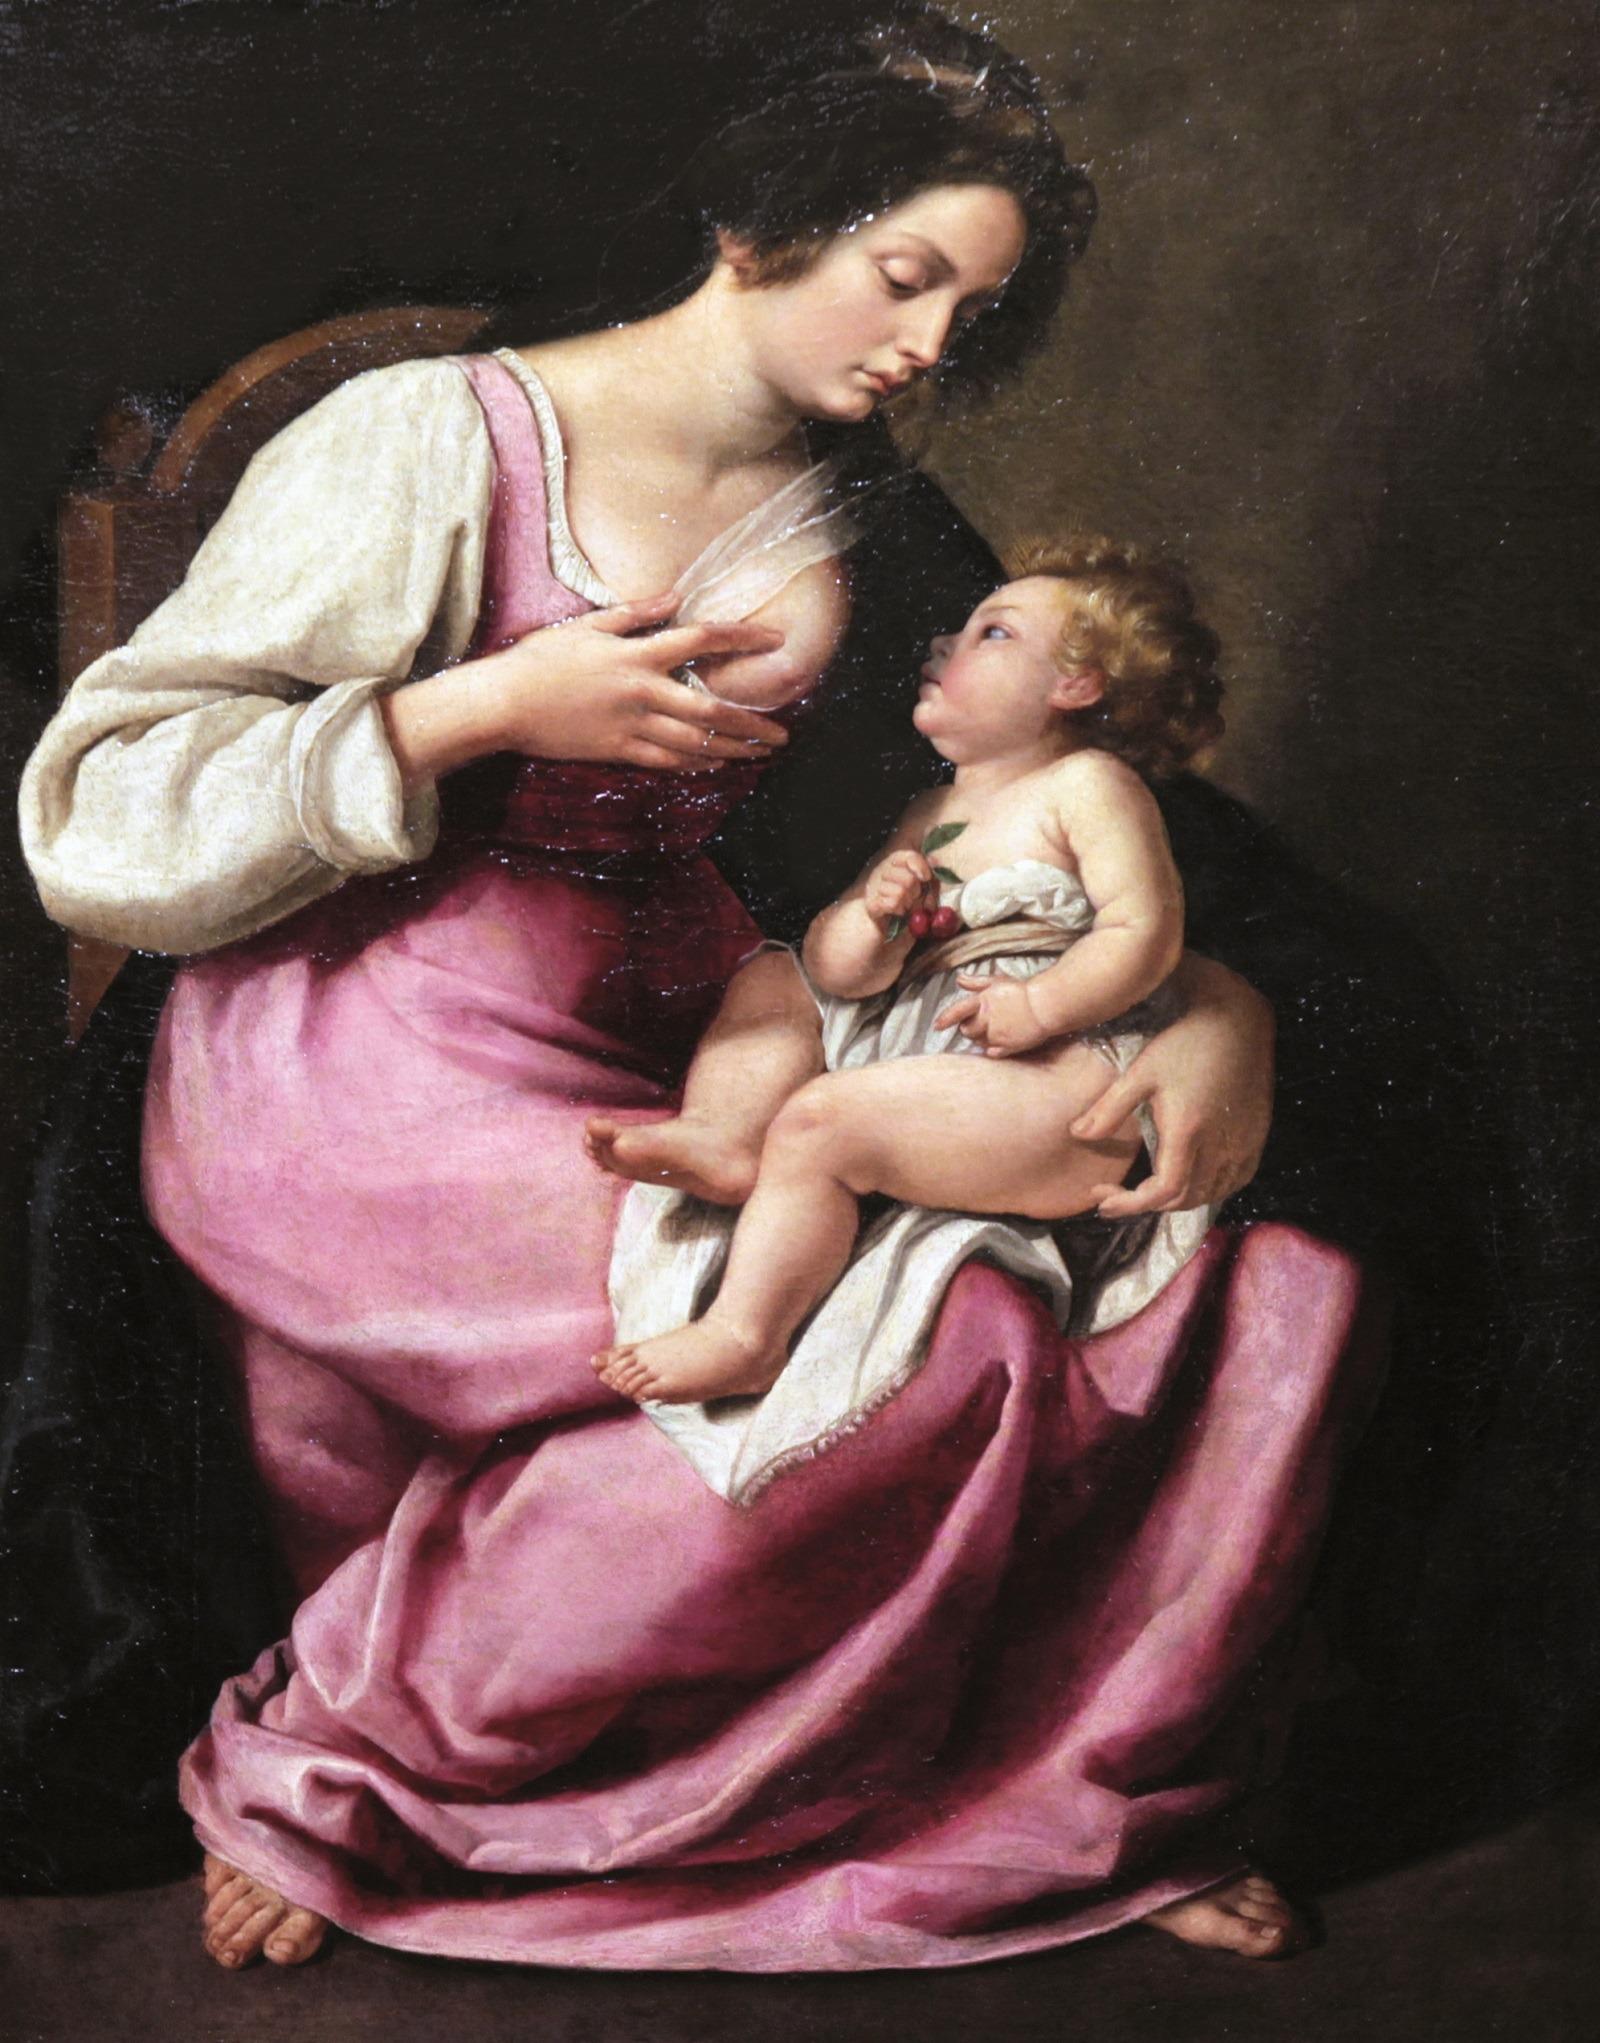 Artemisia Gentileschi's Madonna and Child